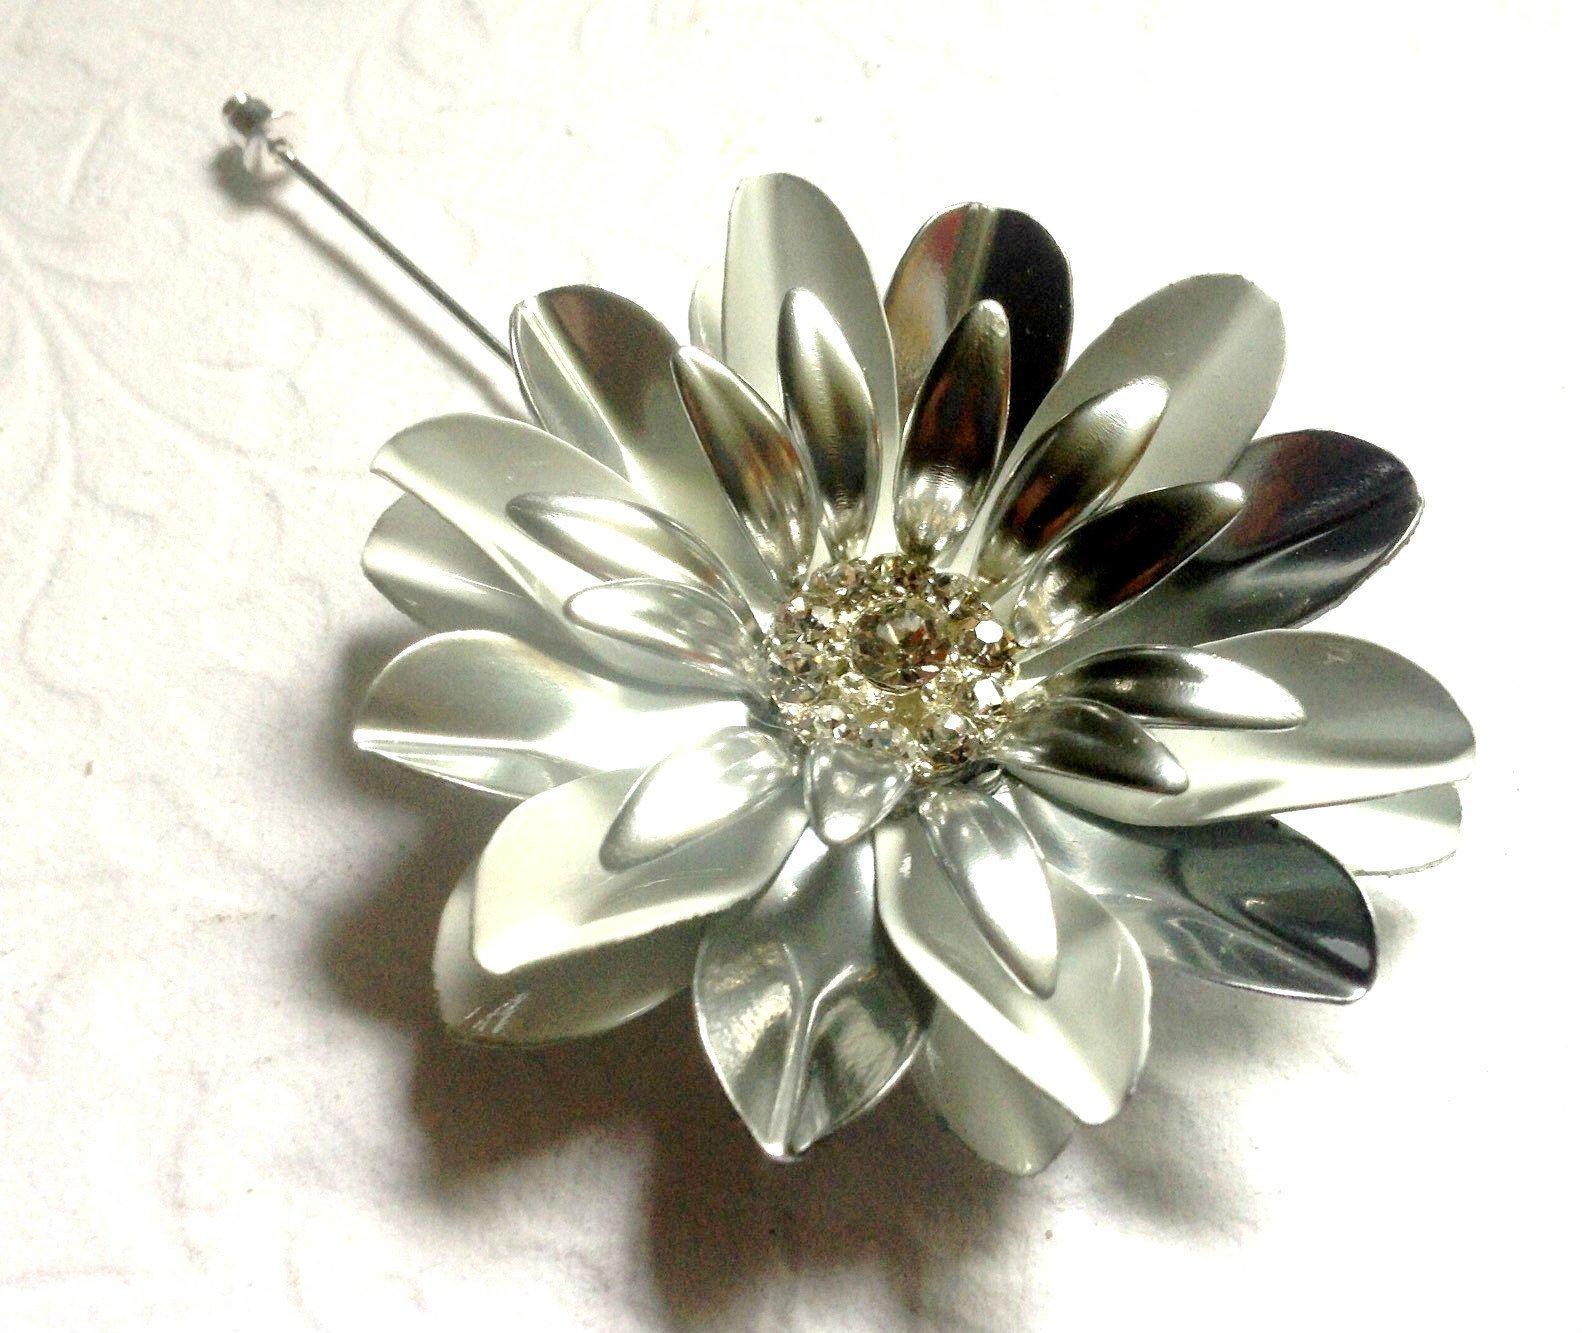 Large White and Silvertone Painted Metal Flower Lapel Pin Enamel Rhinestone Daisy